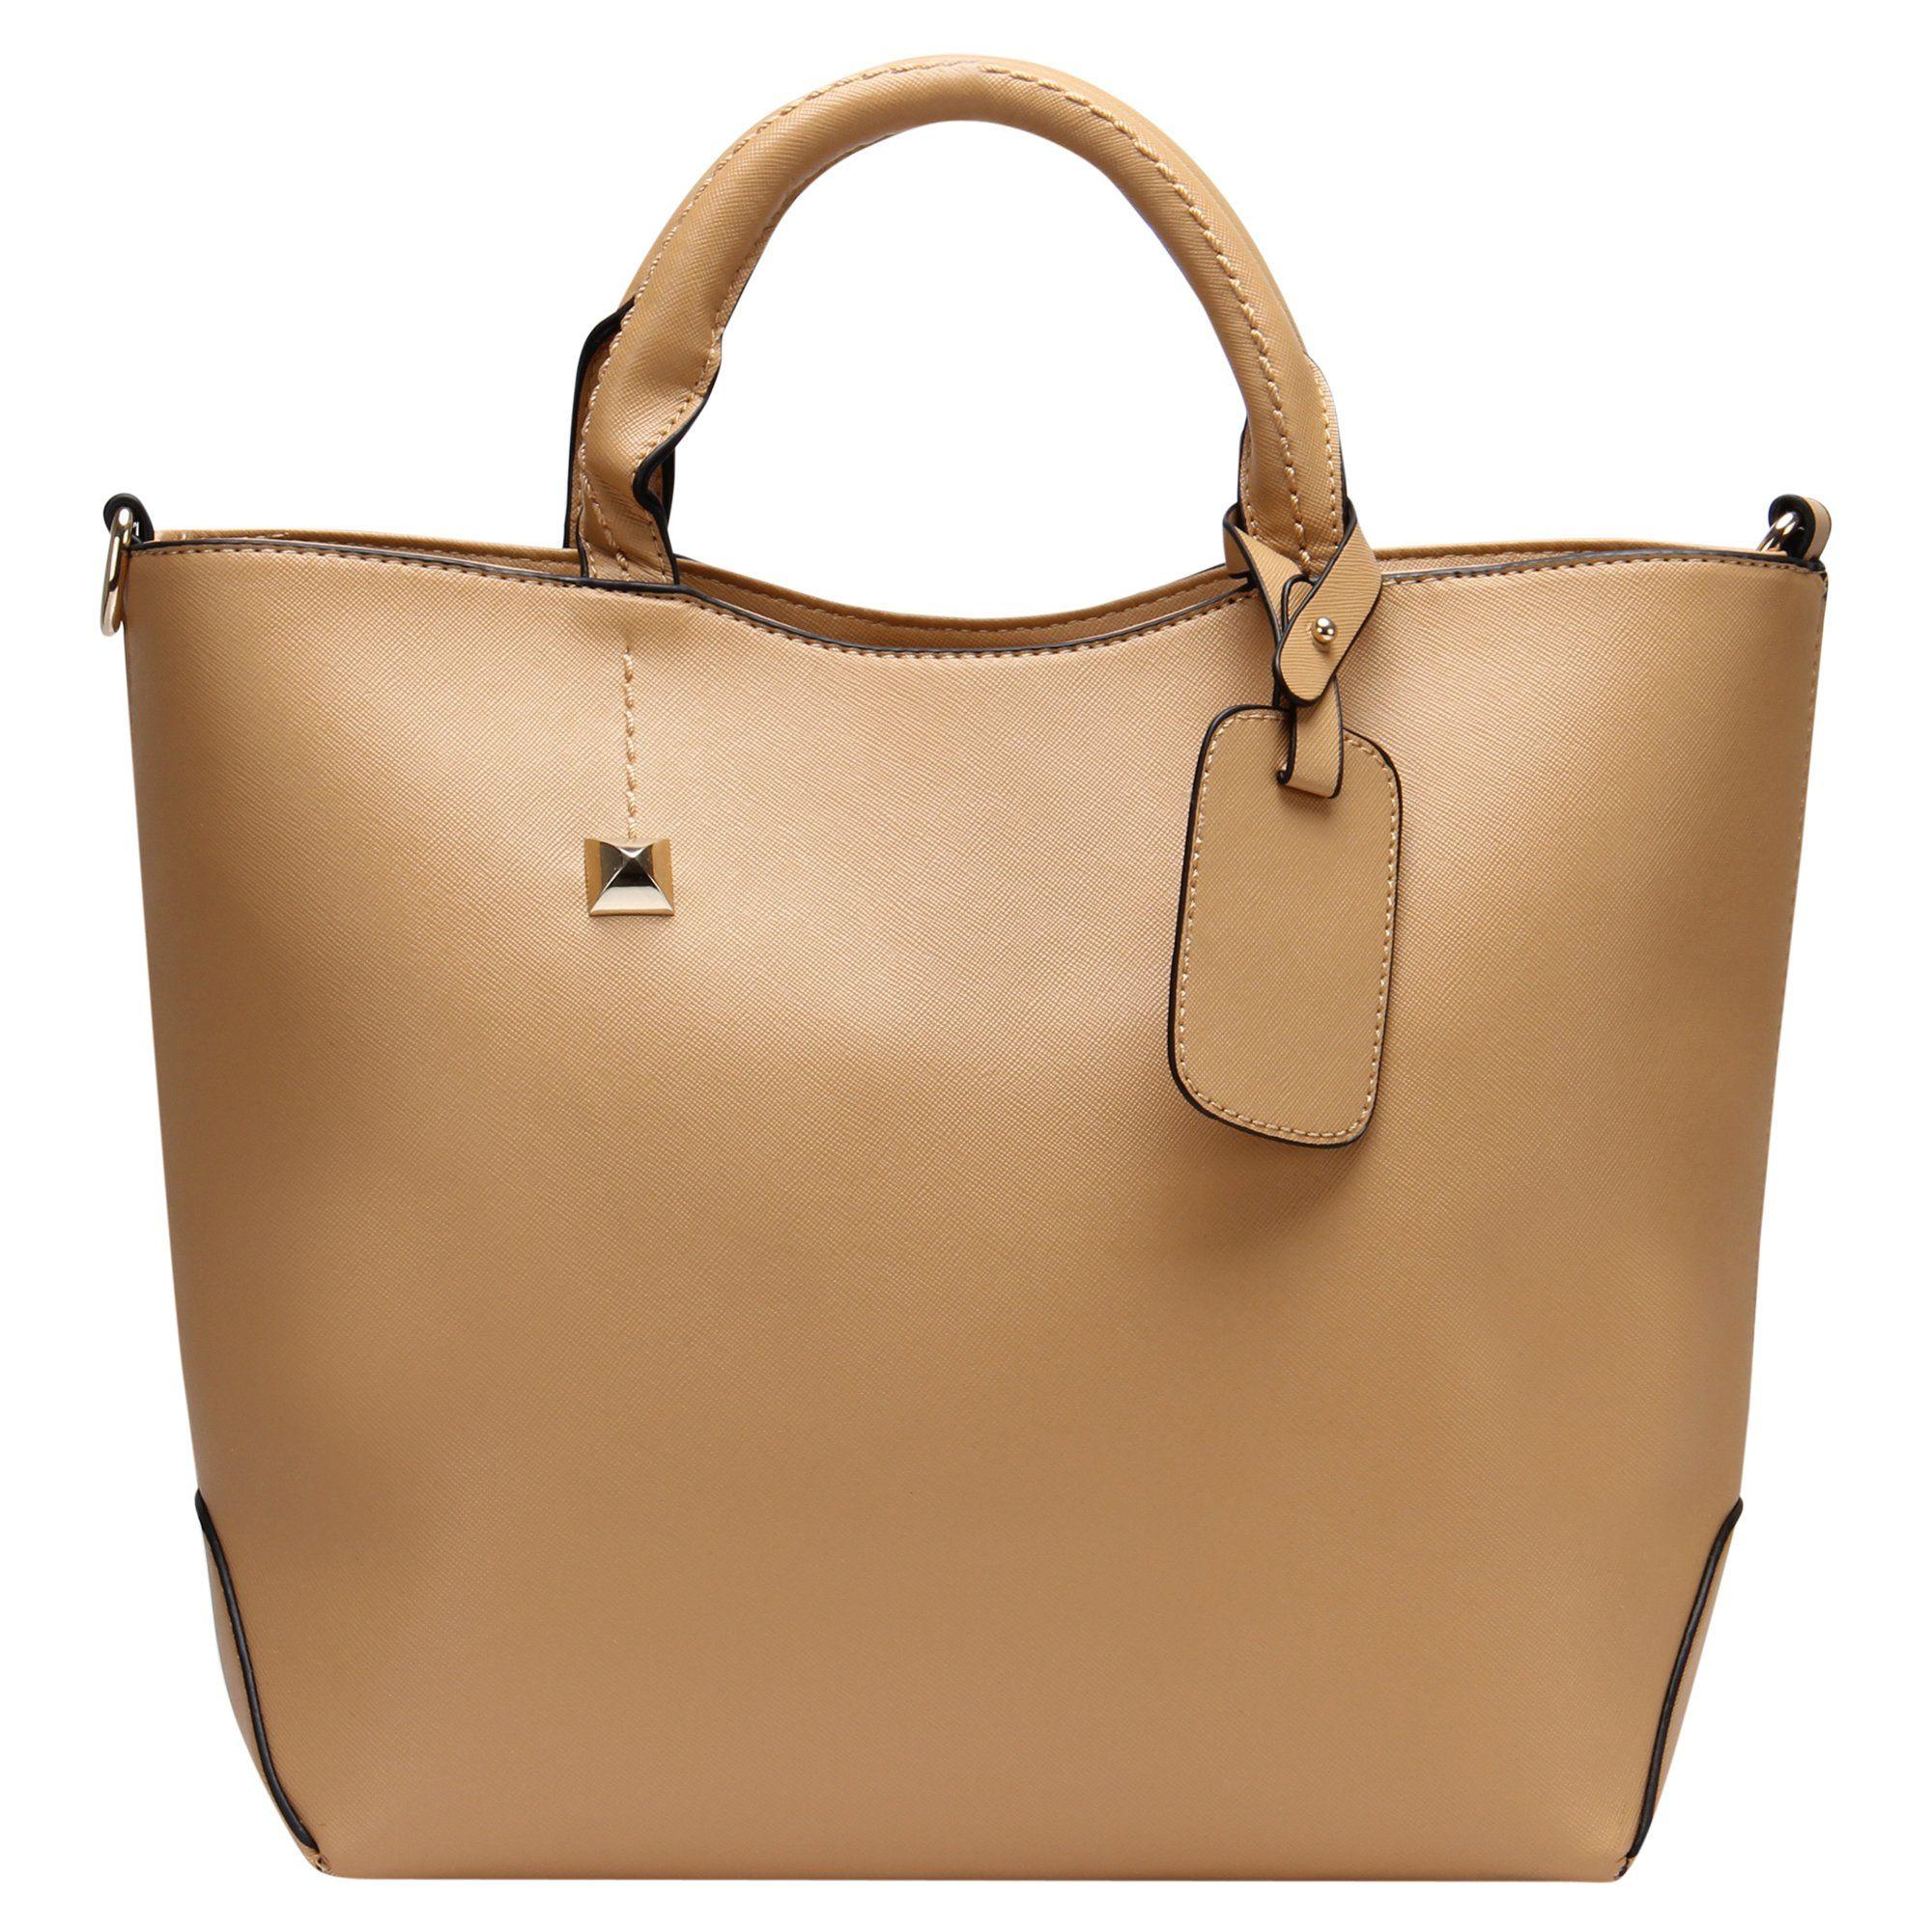 4b374093d5ce Hynes Eagle Womens Patent Leather Boutique Tote Bags Top Handle Handbag  (Khaki)